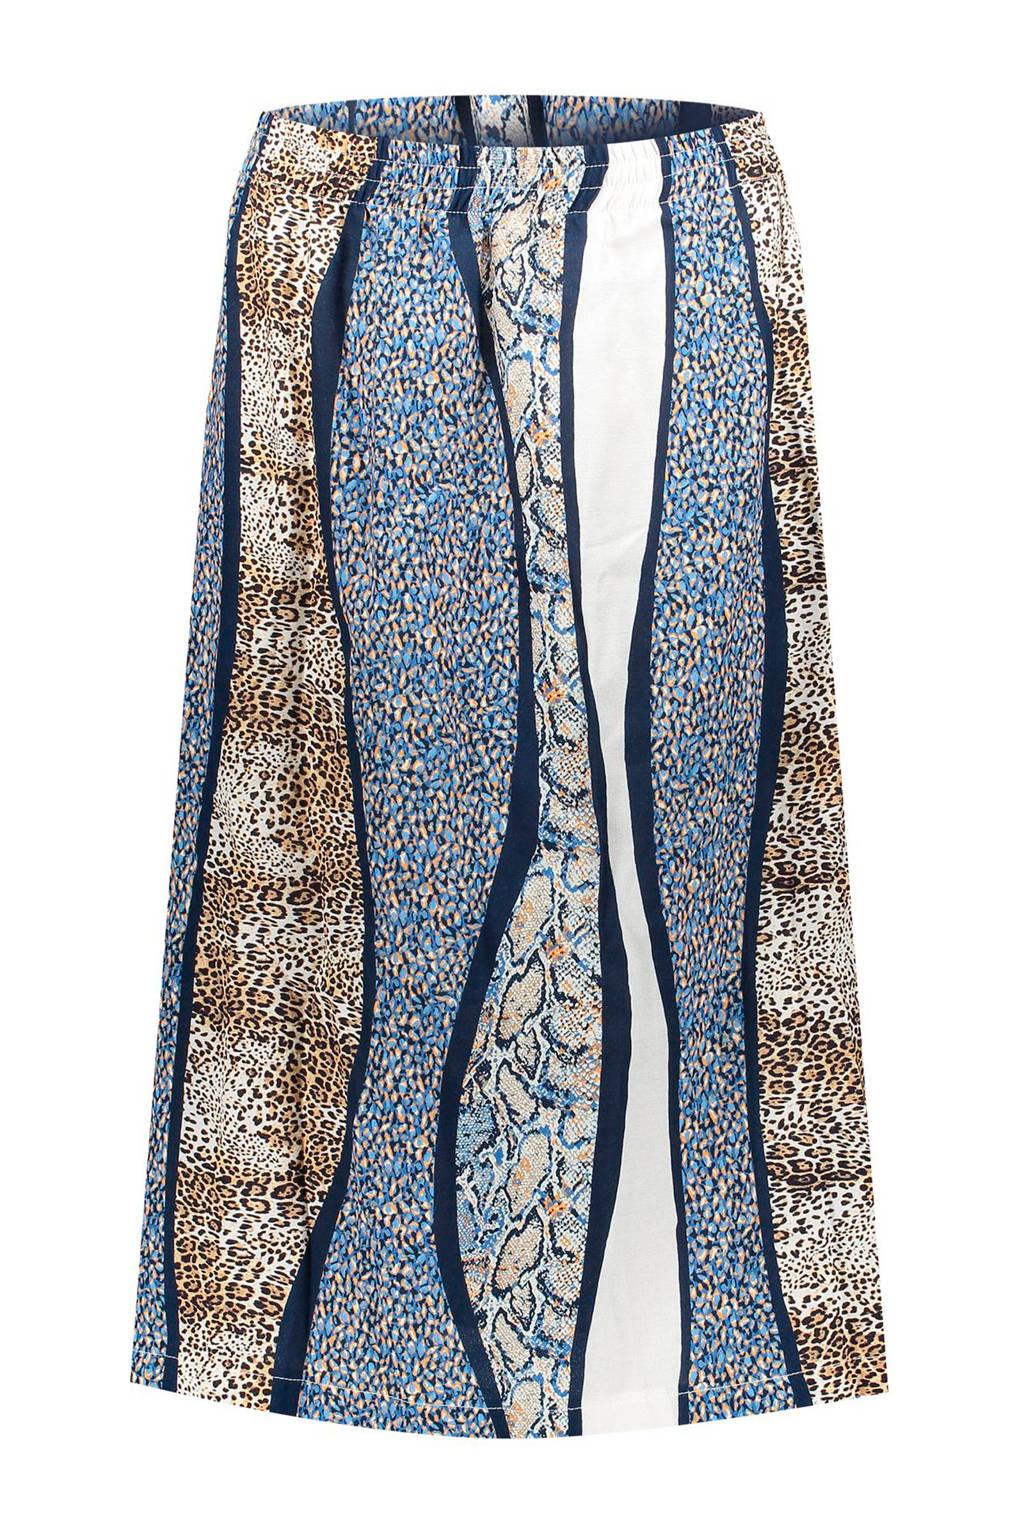 Geisha A-lijn rok blauw/multi, Blauw/multi